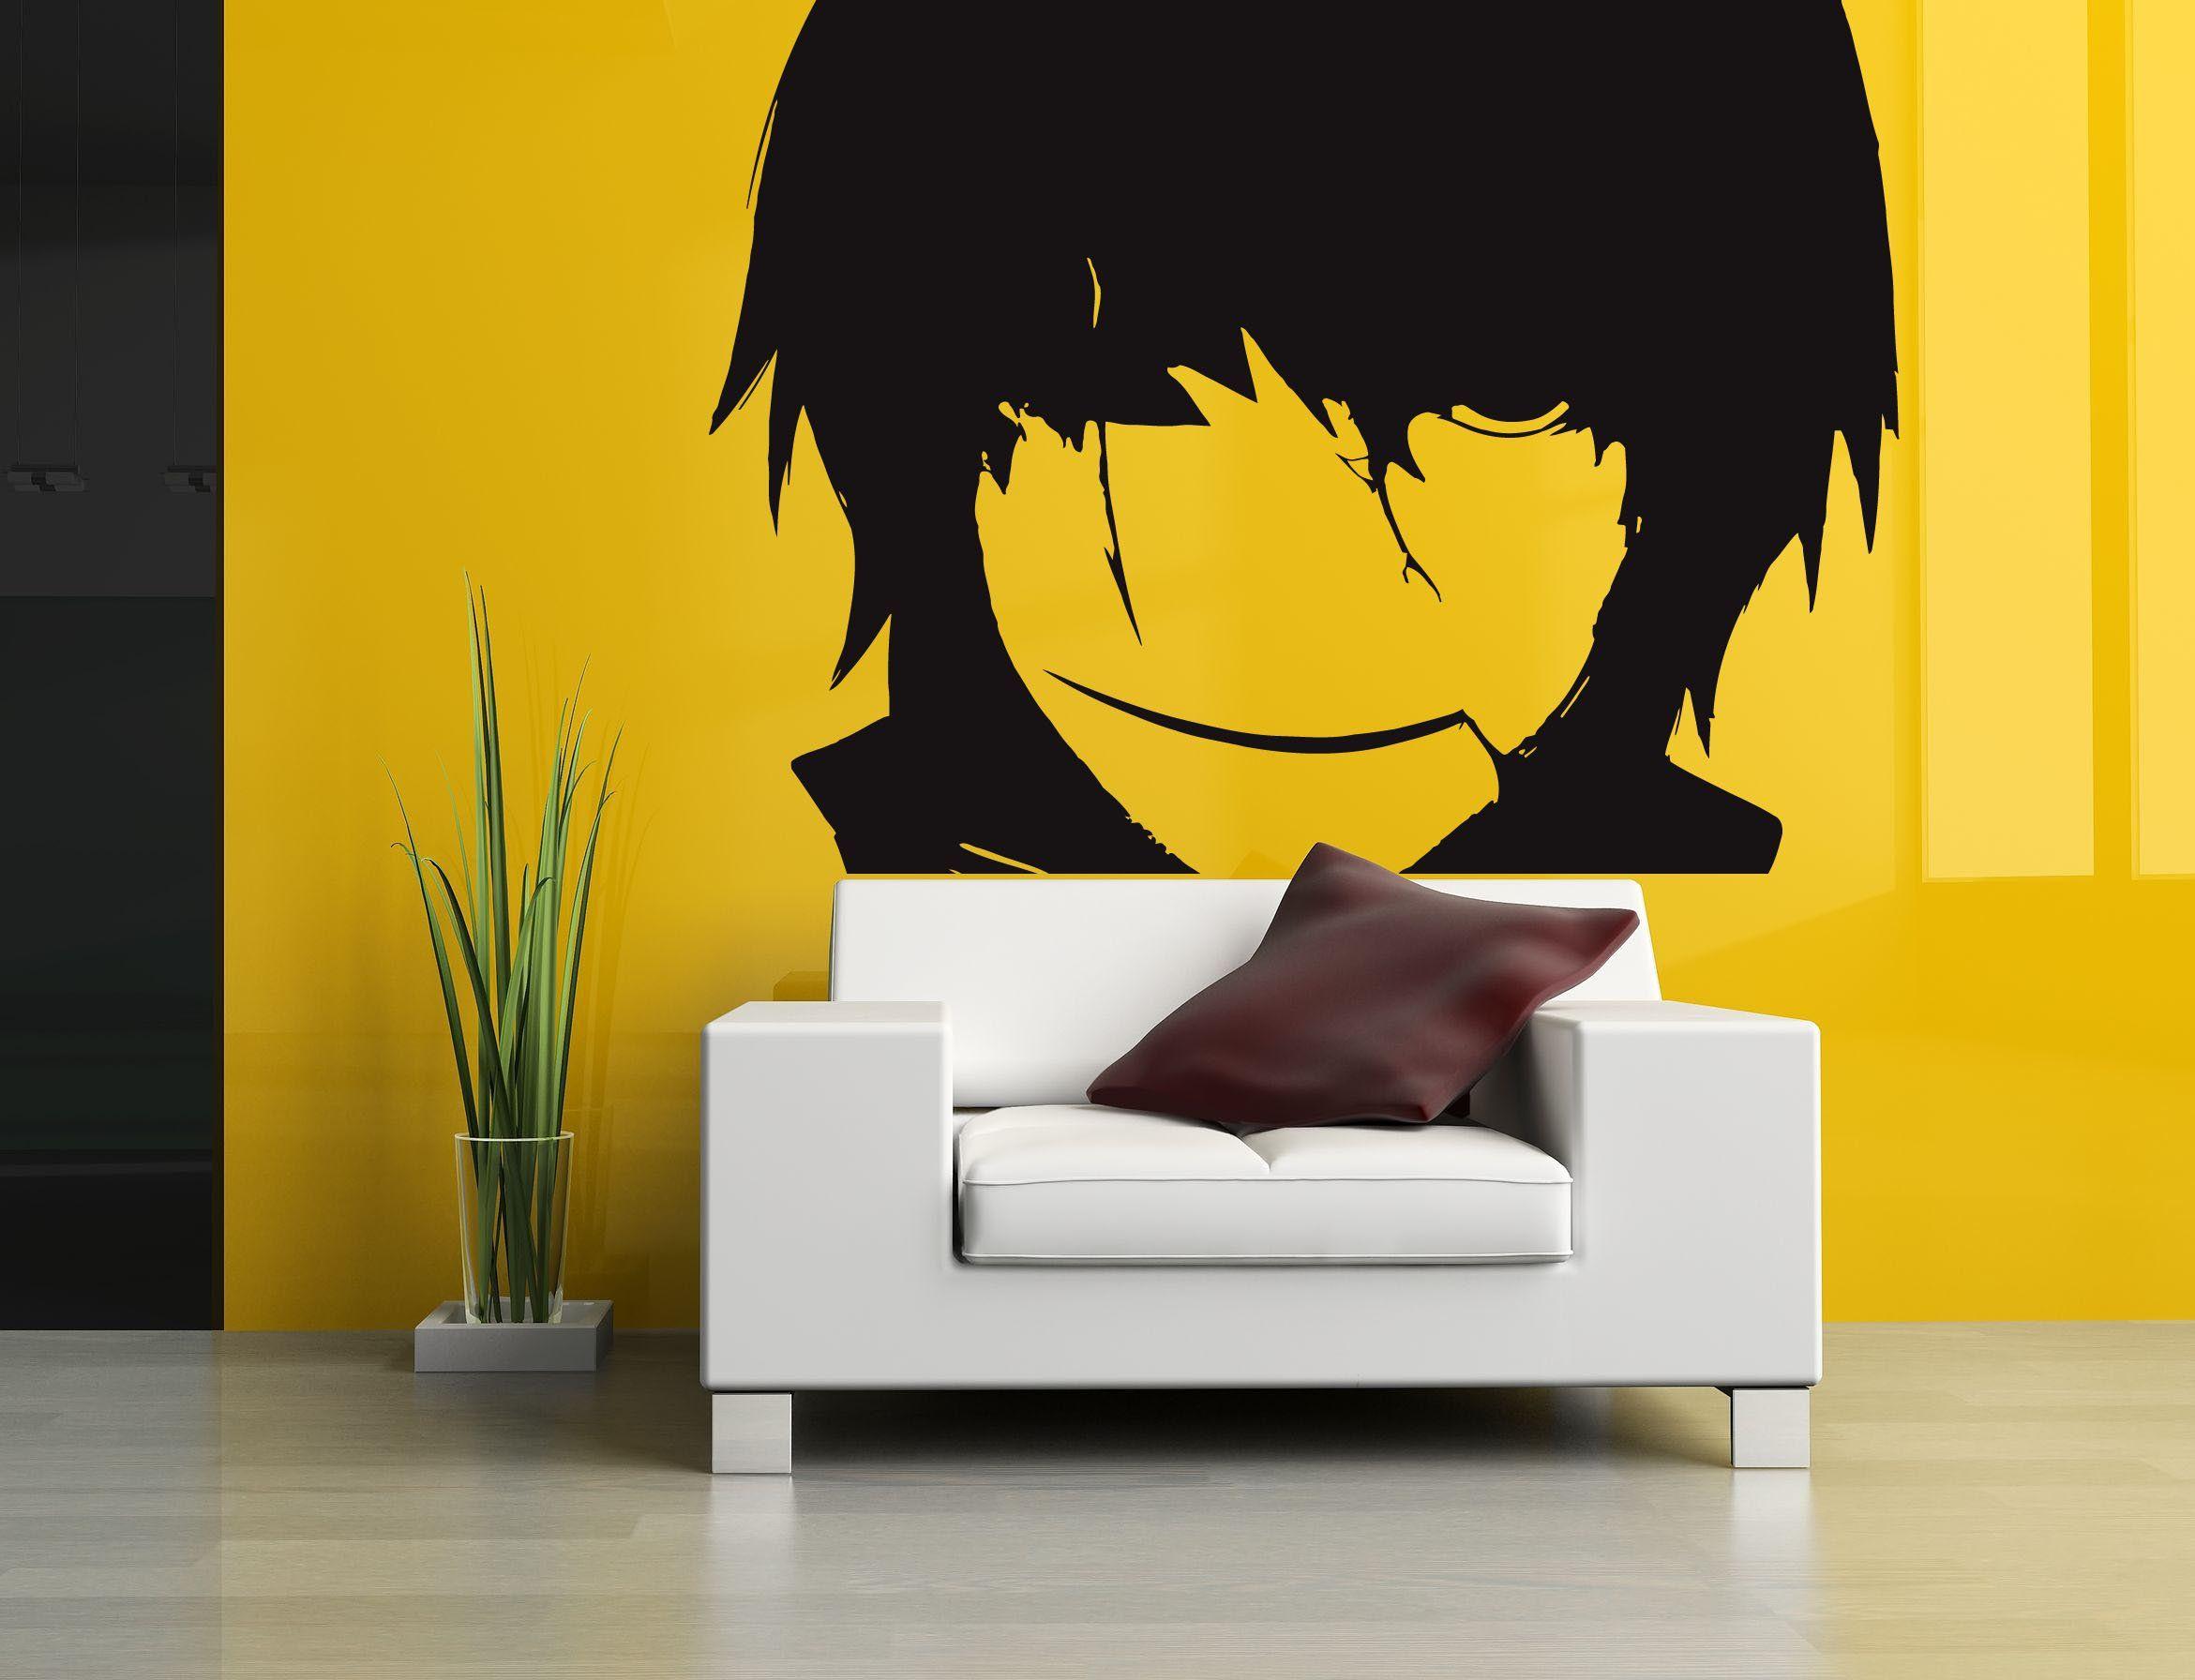 Wall Room Decor Art Vinyl Sticker Mural Decal Anime Hentai Manga Big ...